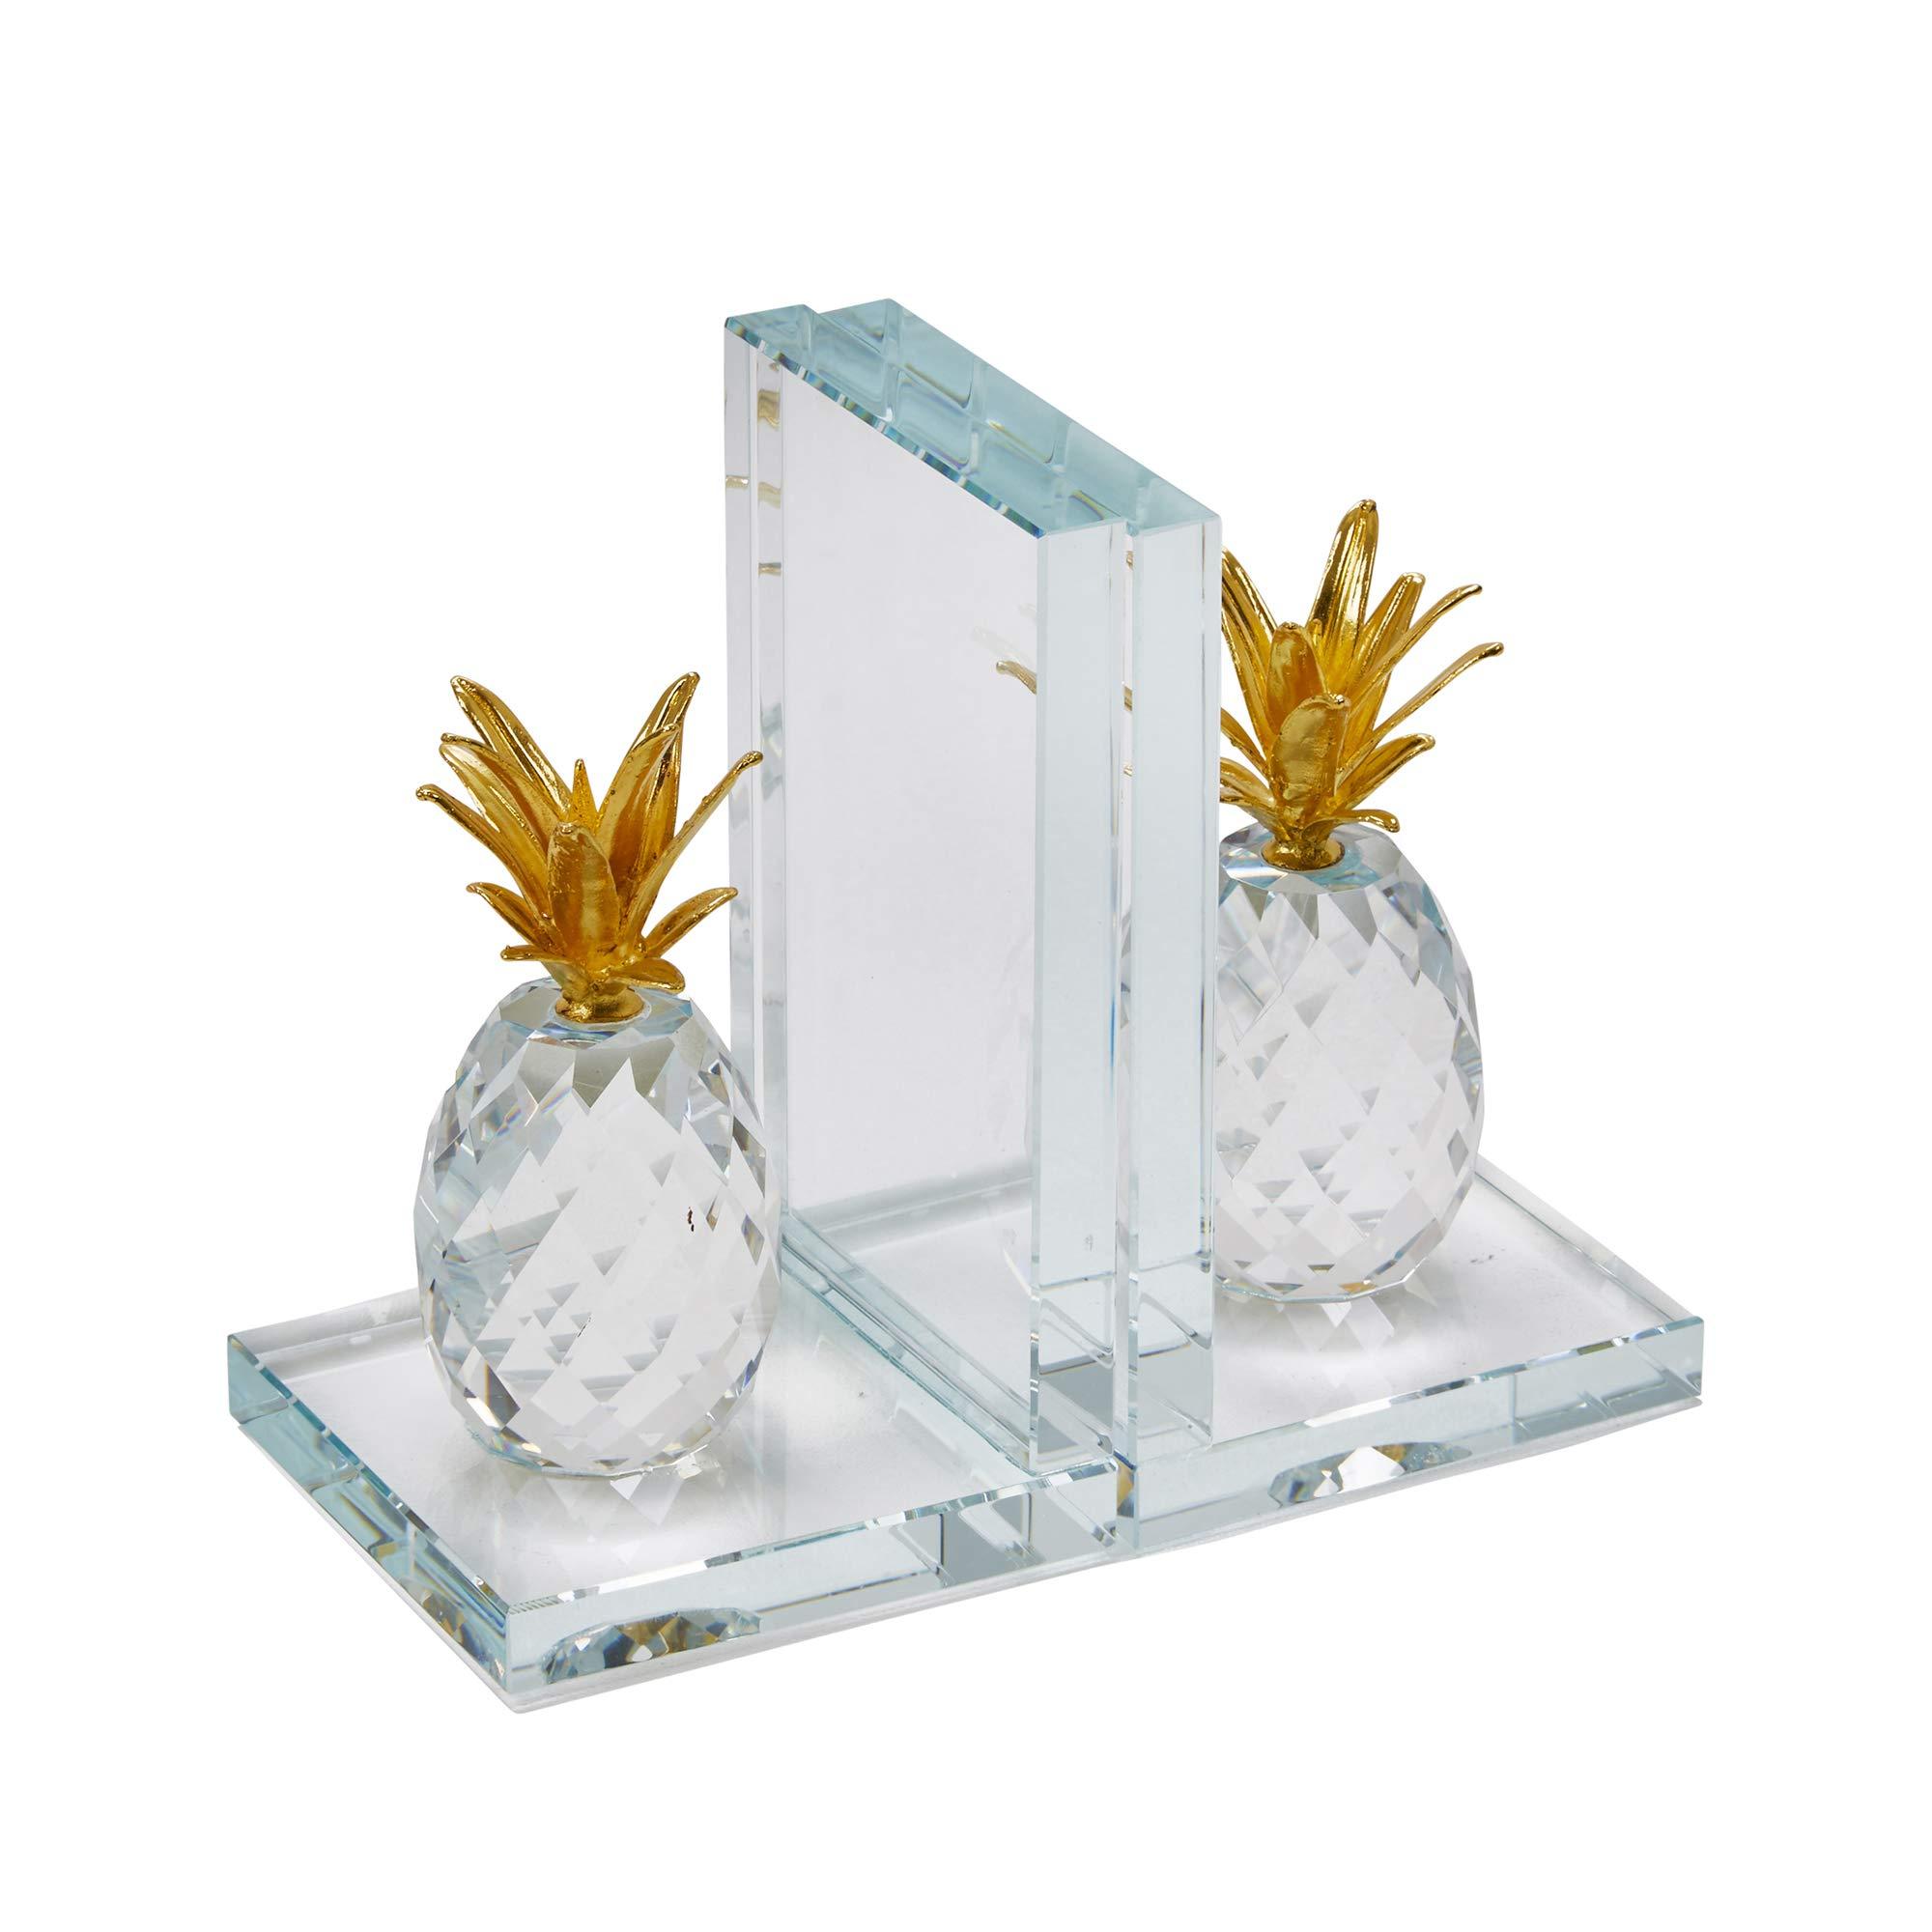 - White NY8003 Contemporary Book Shelf Decor Set of 2 Helping Hands Bookend Set Danya B